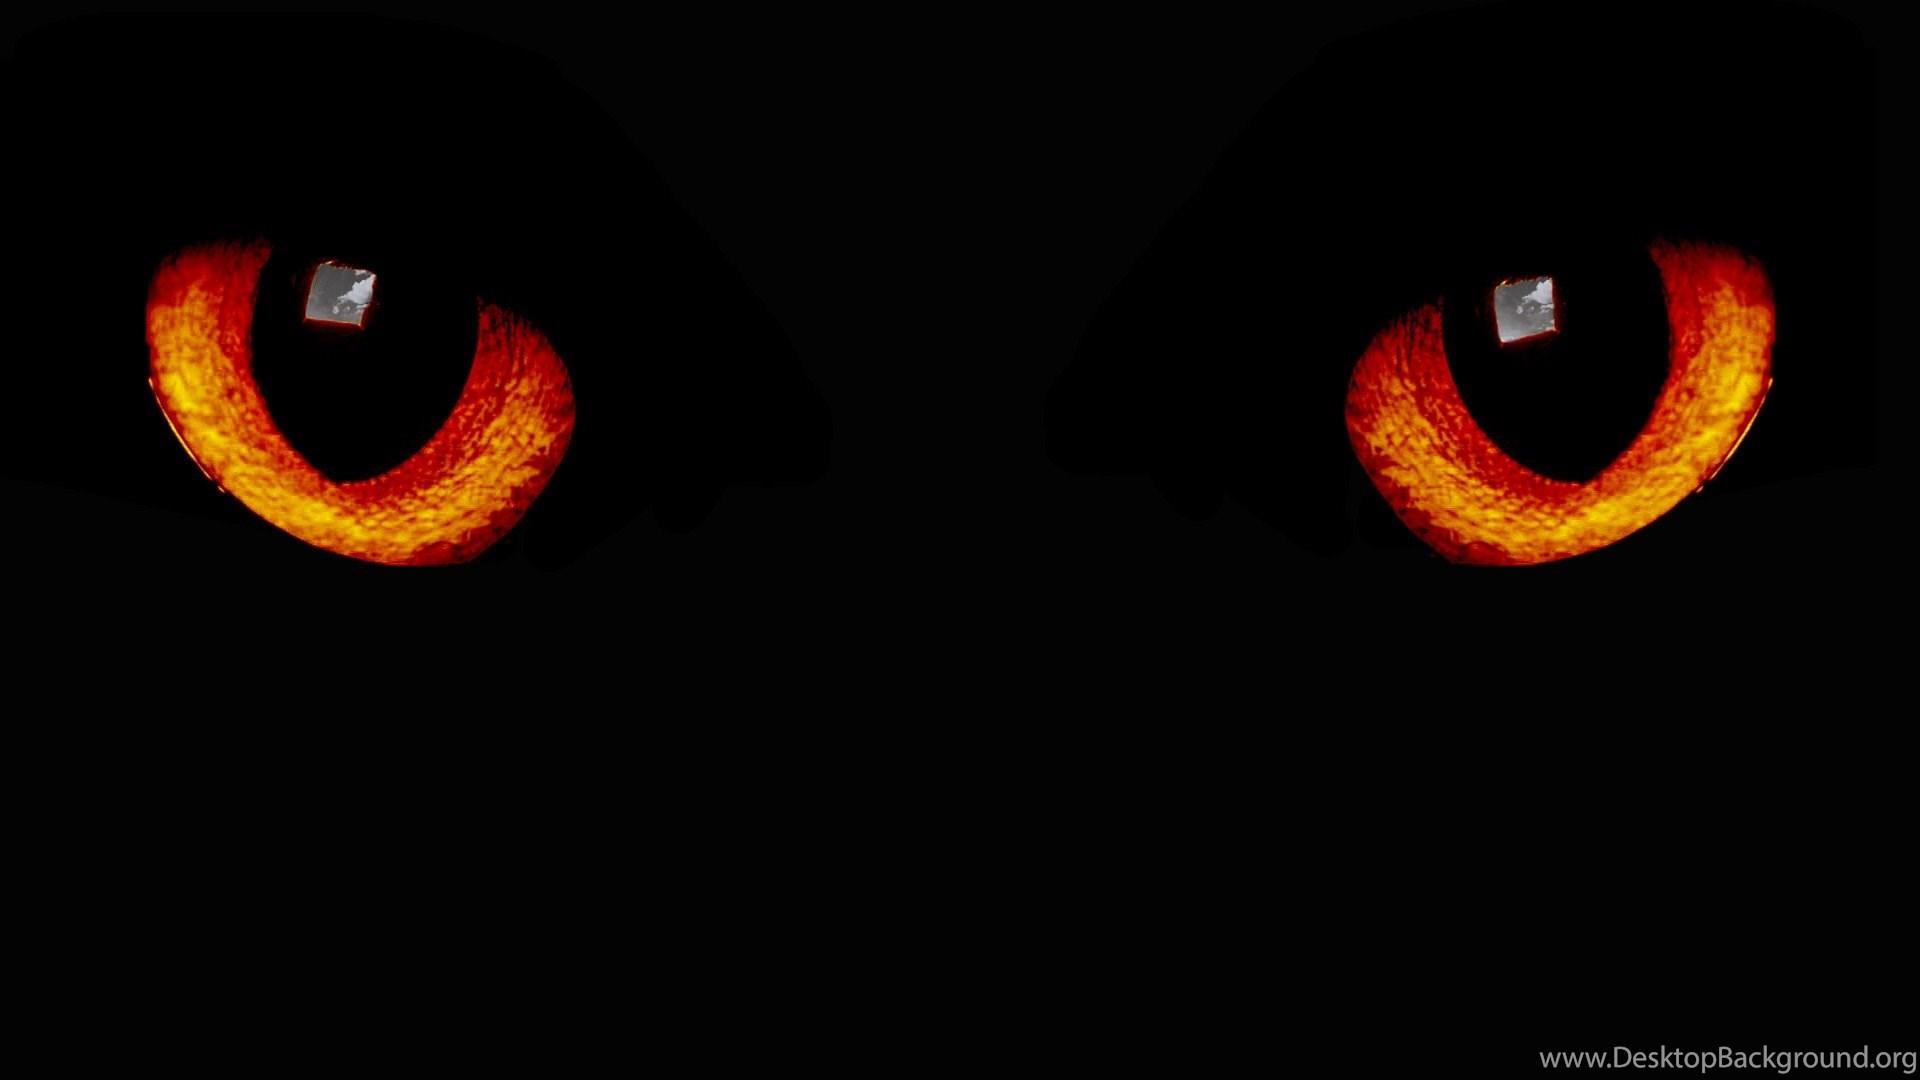 Wallpapers black night eyes dark red cats littleteufel - Animal black background wallpaper ...